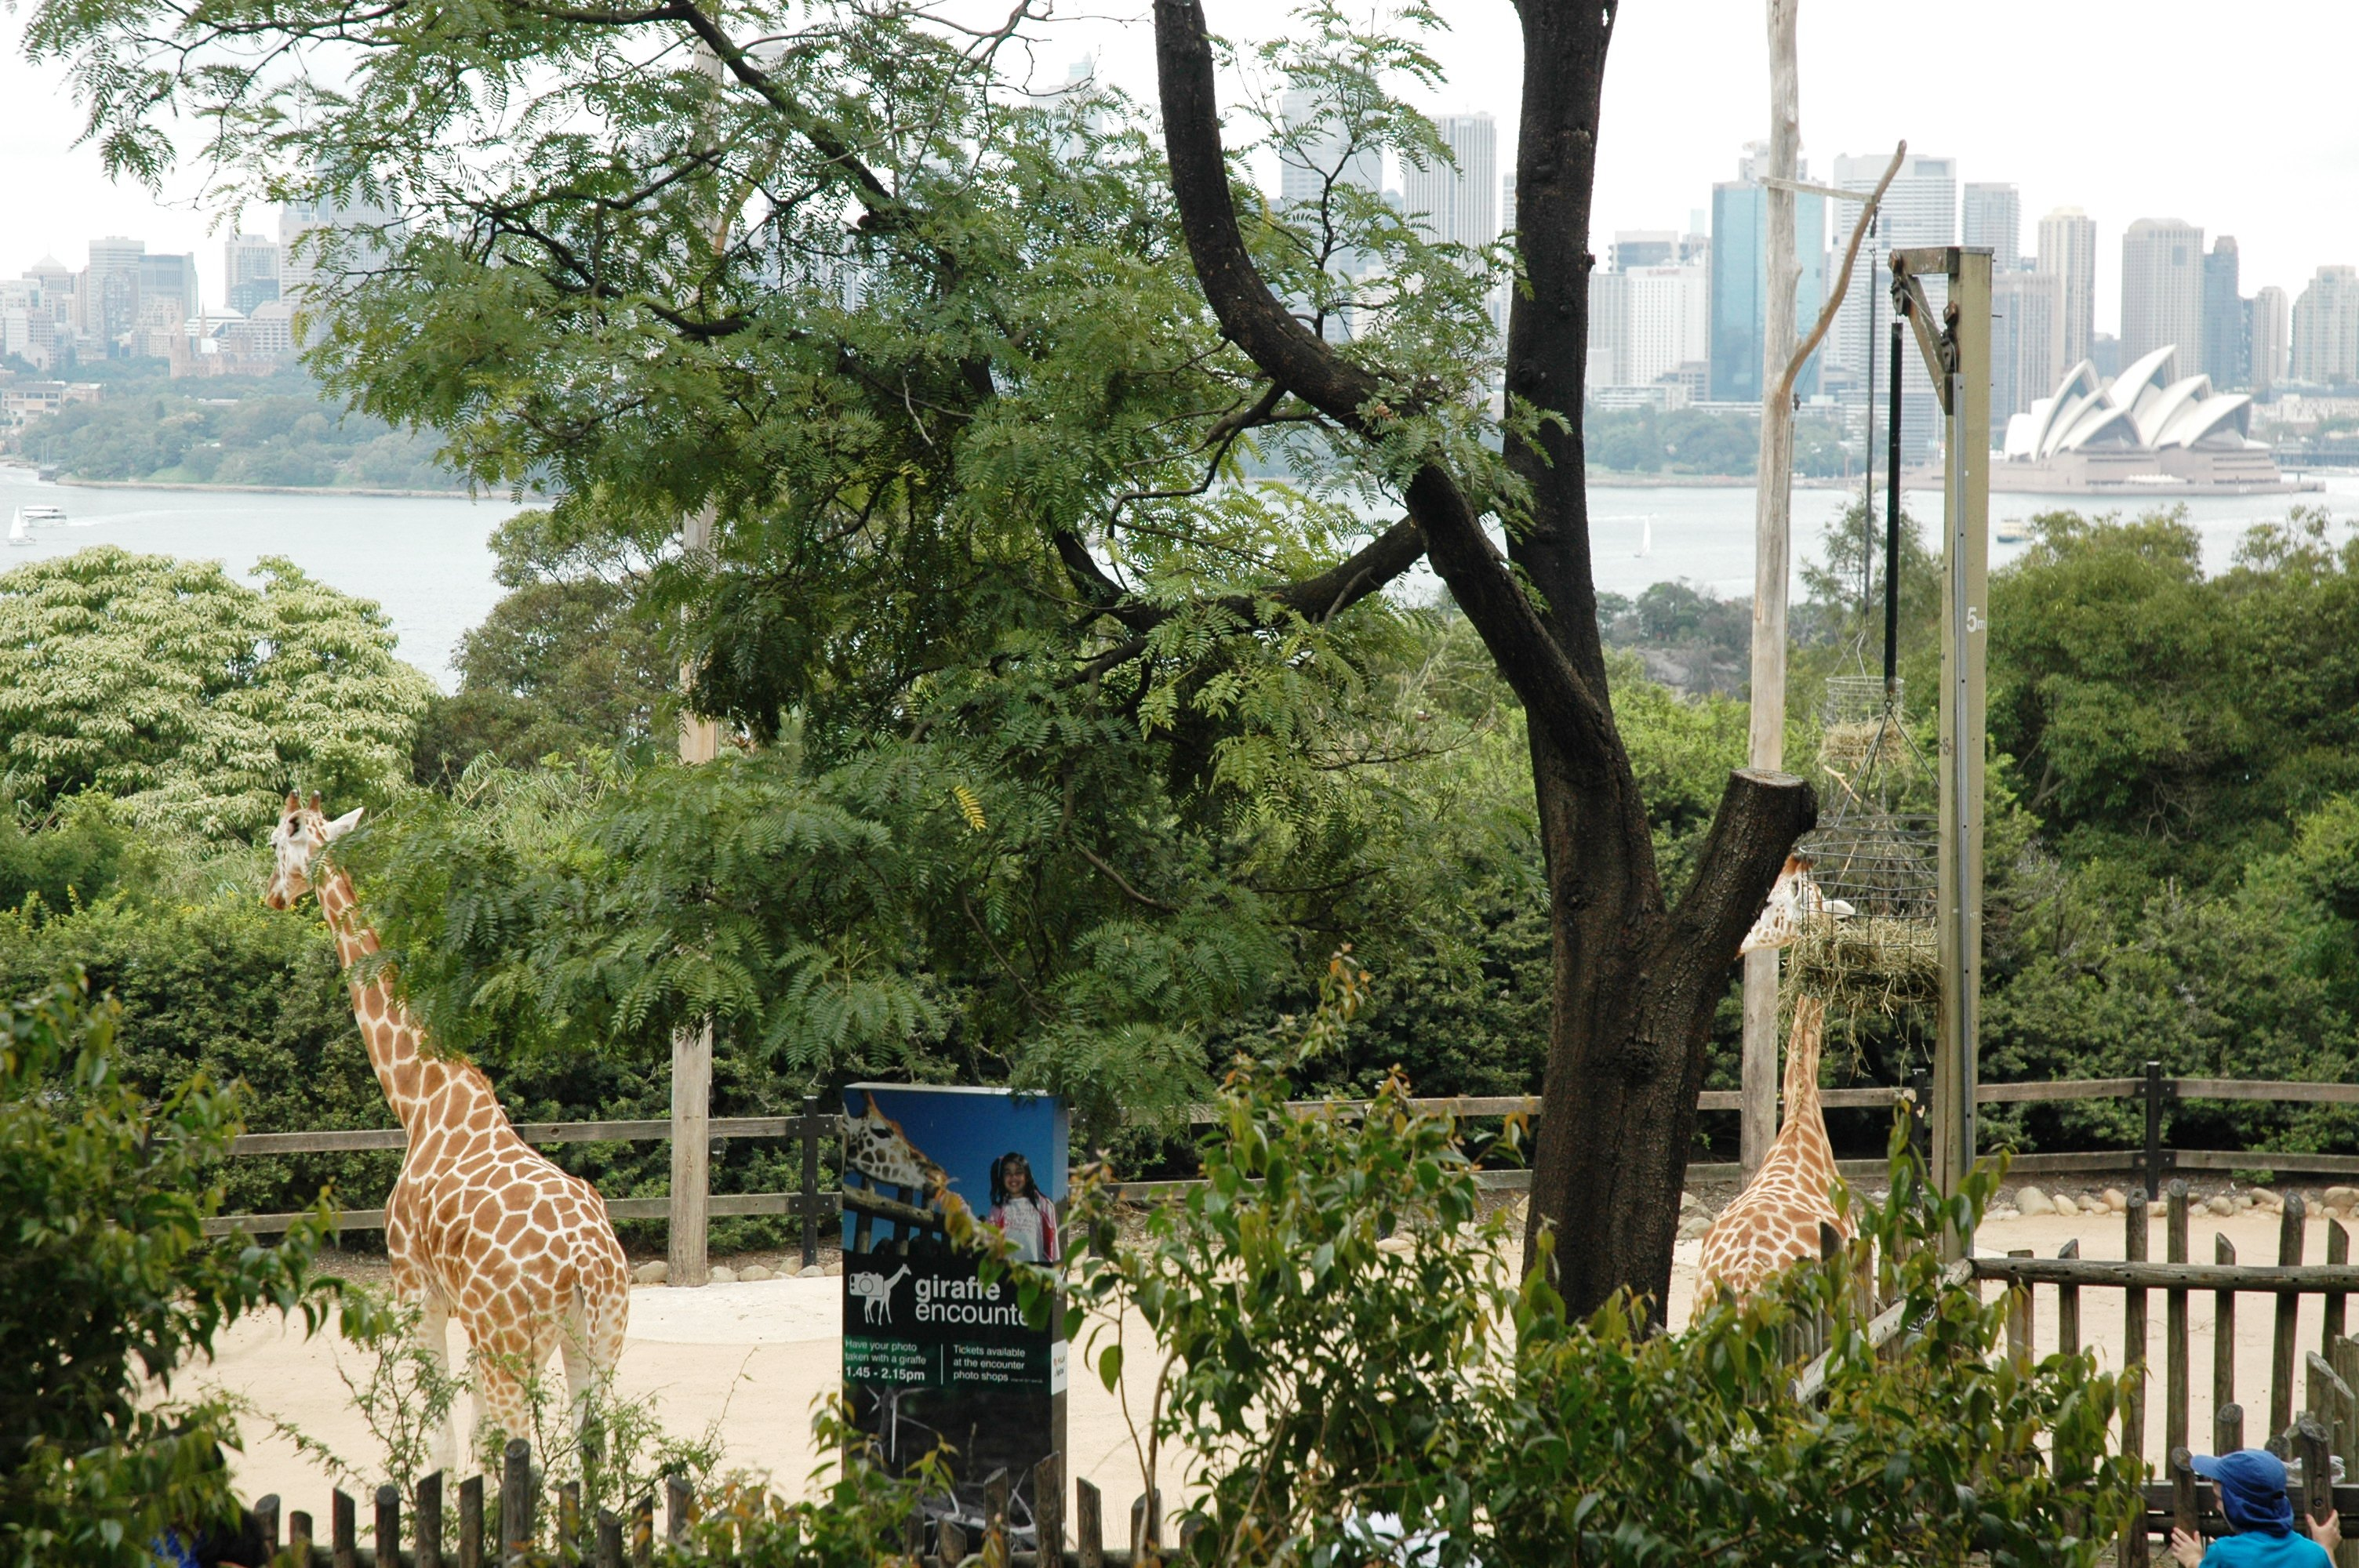 Giraffes Taronga Sydney Opera House